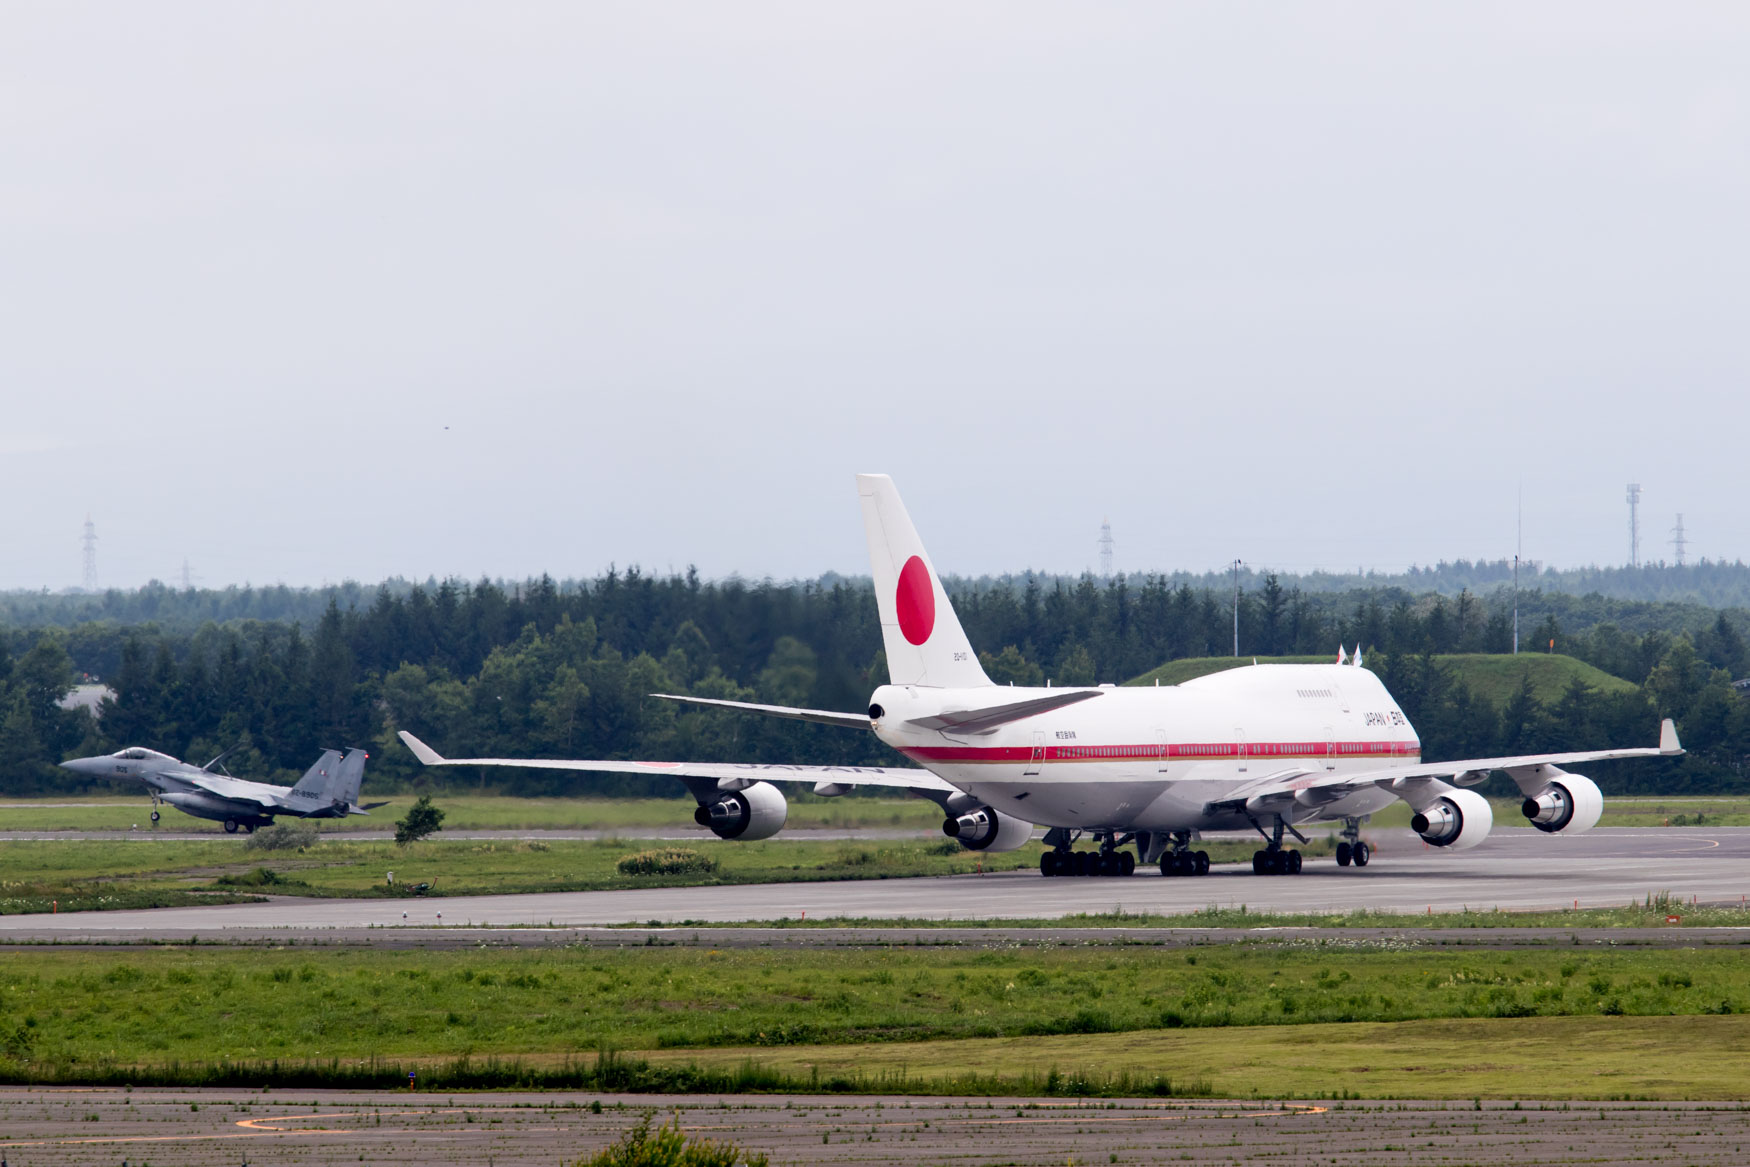 Japan Air Self Defense Force 747 at Chitose Air Festival